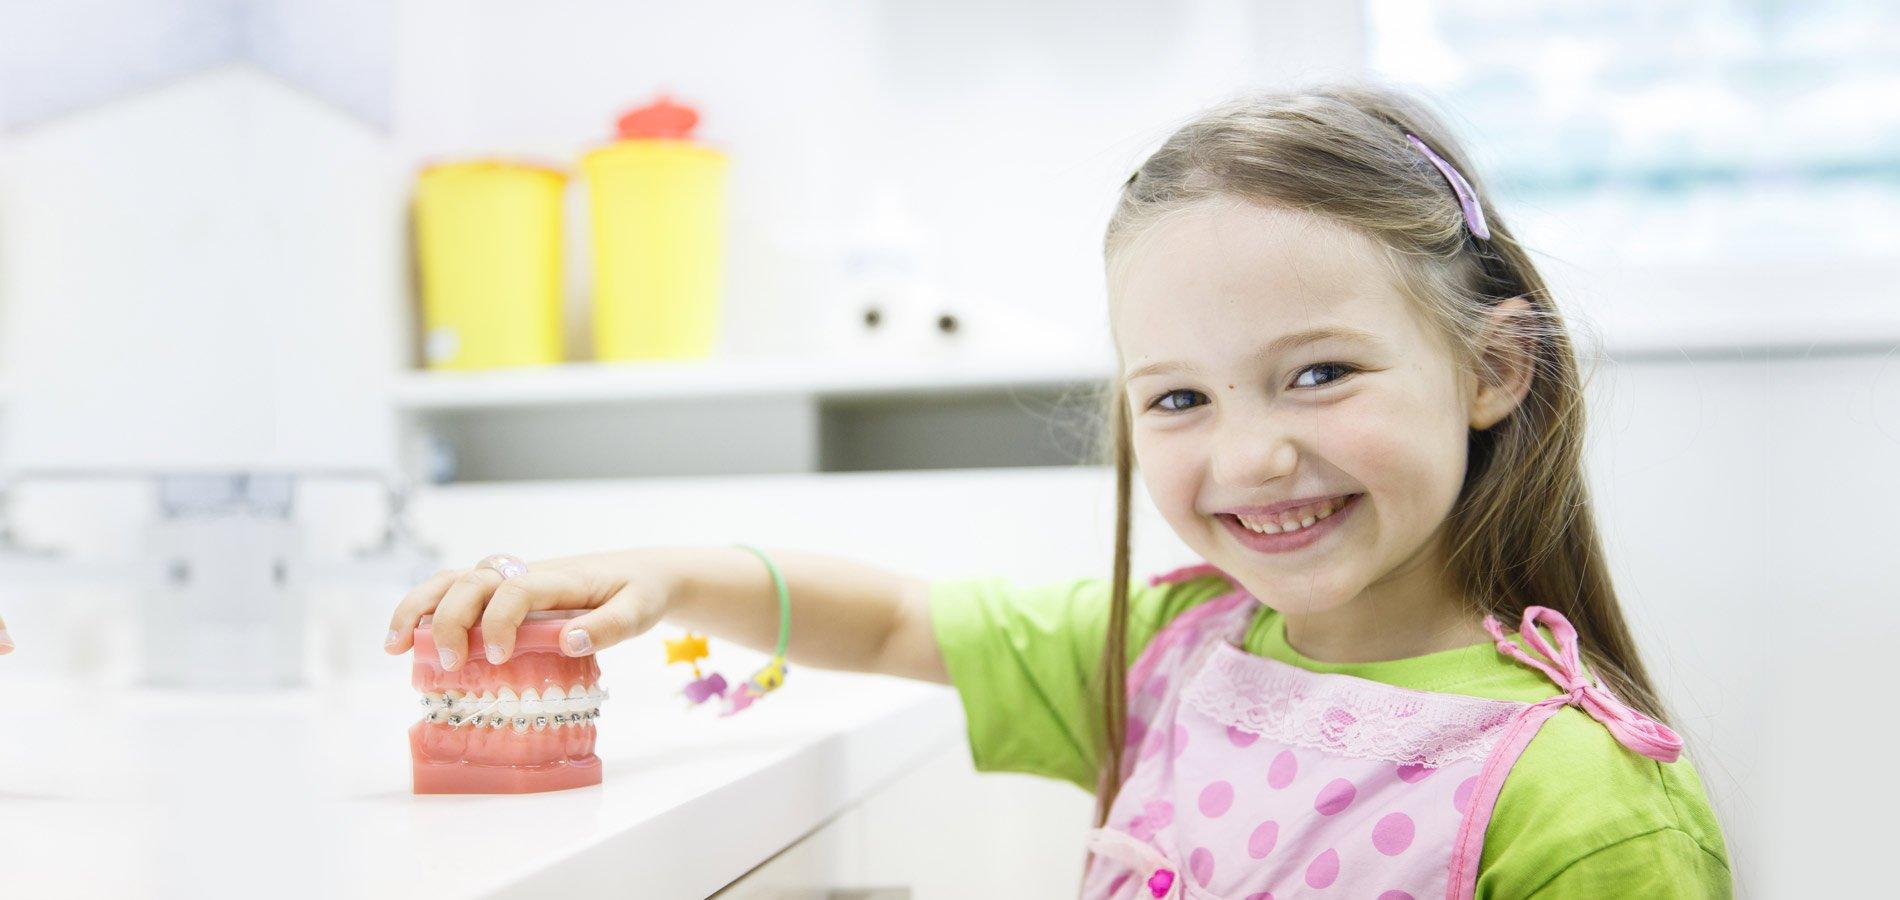 çocuk ortodonti